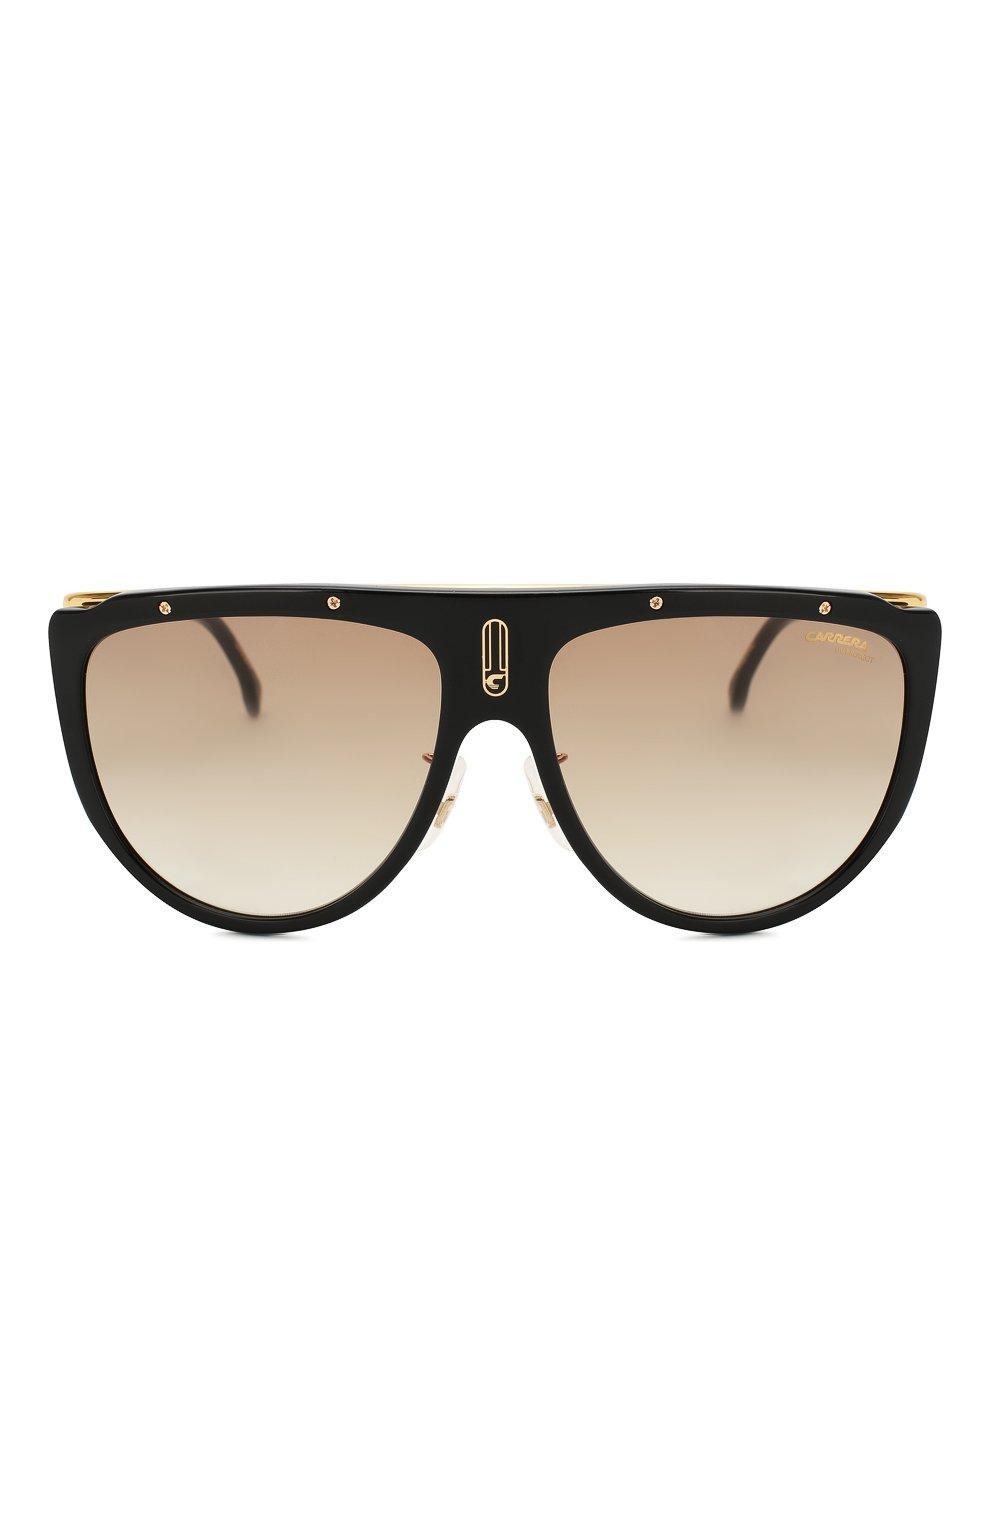 Женские солнцезащитные очки CARRERA коричневого цвета, арт. CARRERA 1023 2M2   Фото 3 (Тип очков: С/з; Статус проверки: Проверено, Проверена категория; Очки форма: Маска, D-форма; Оптика Гендер: оптика-унисекс)